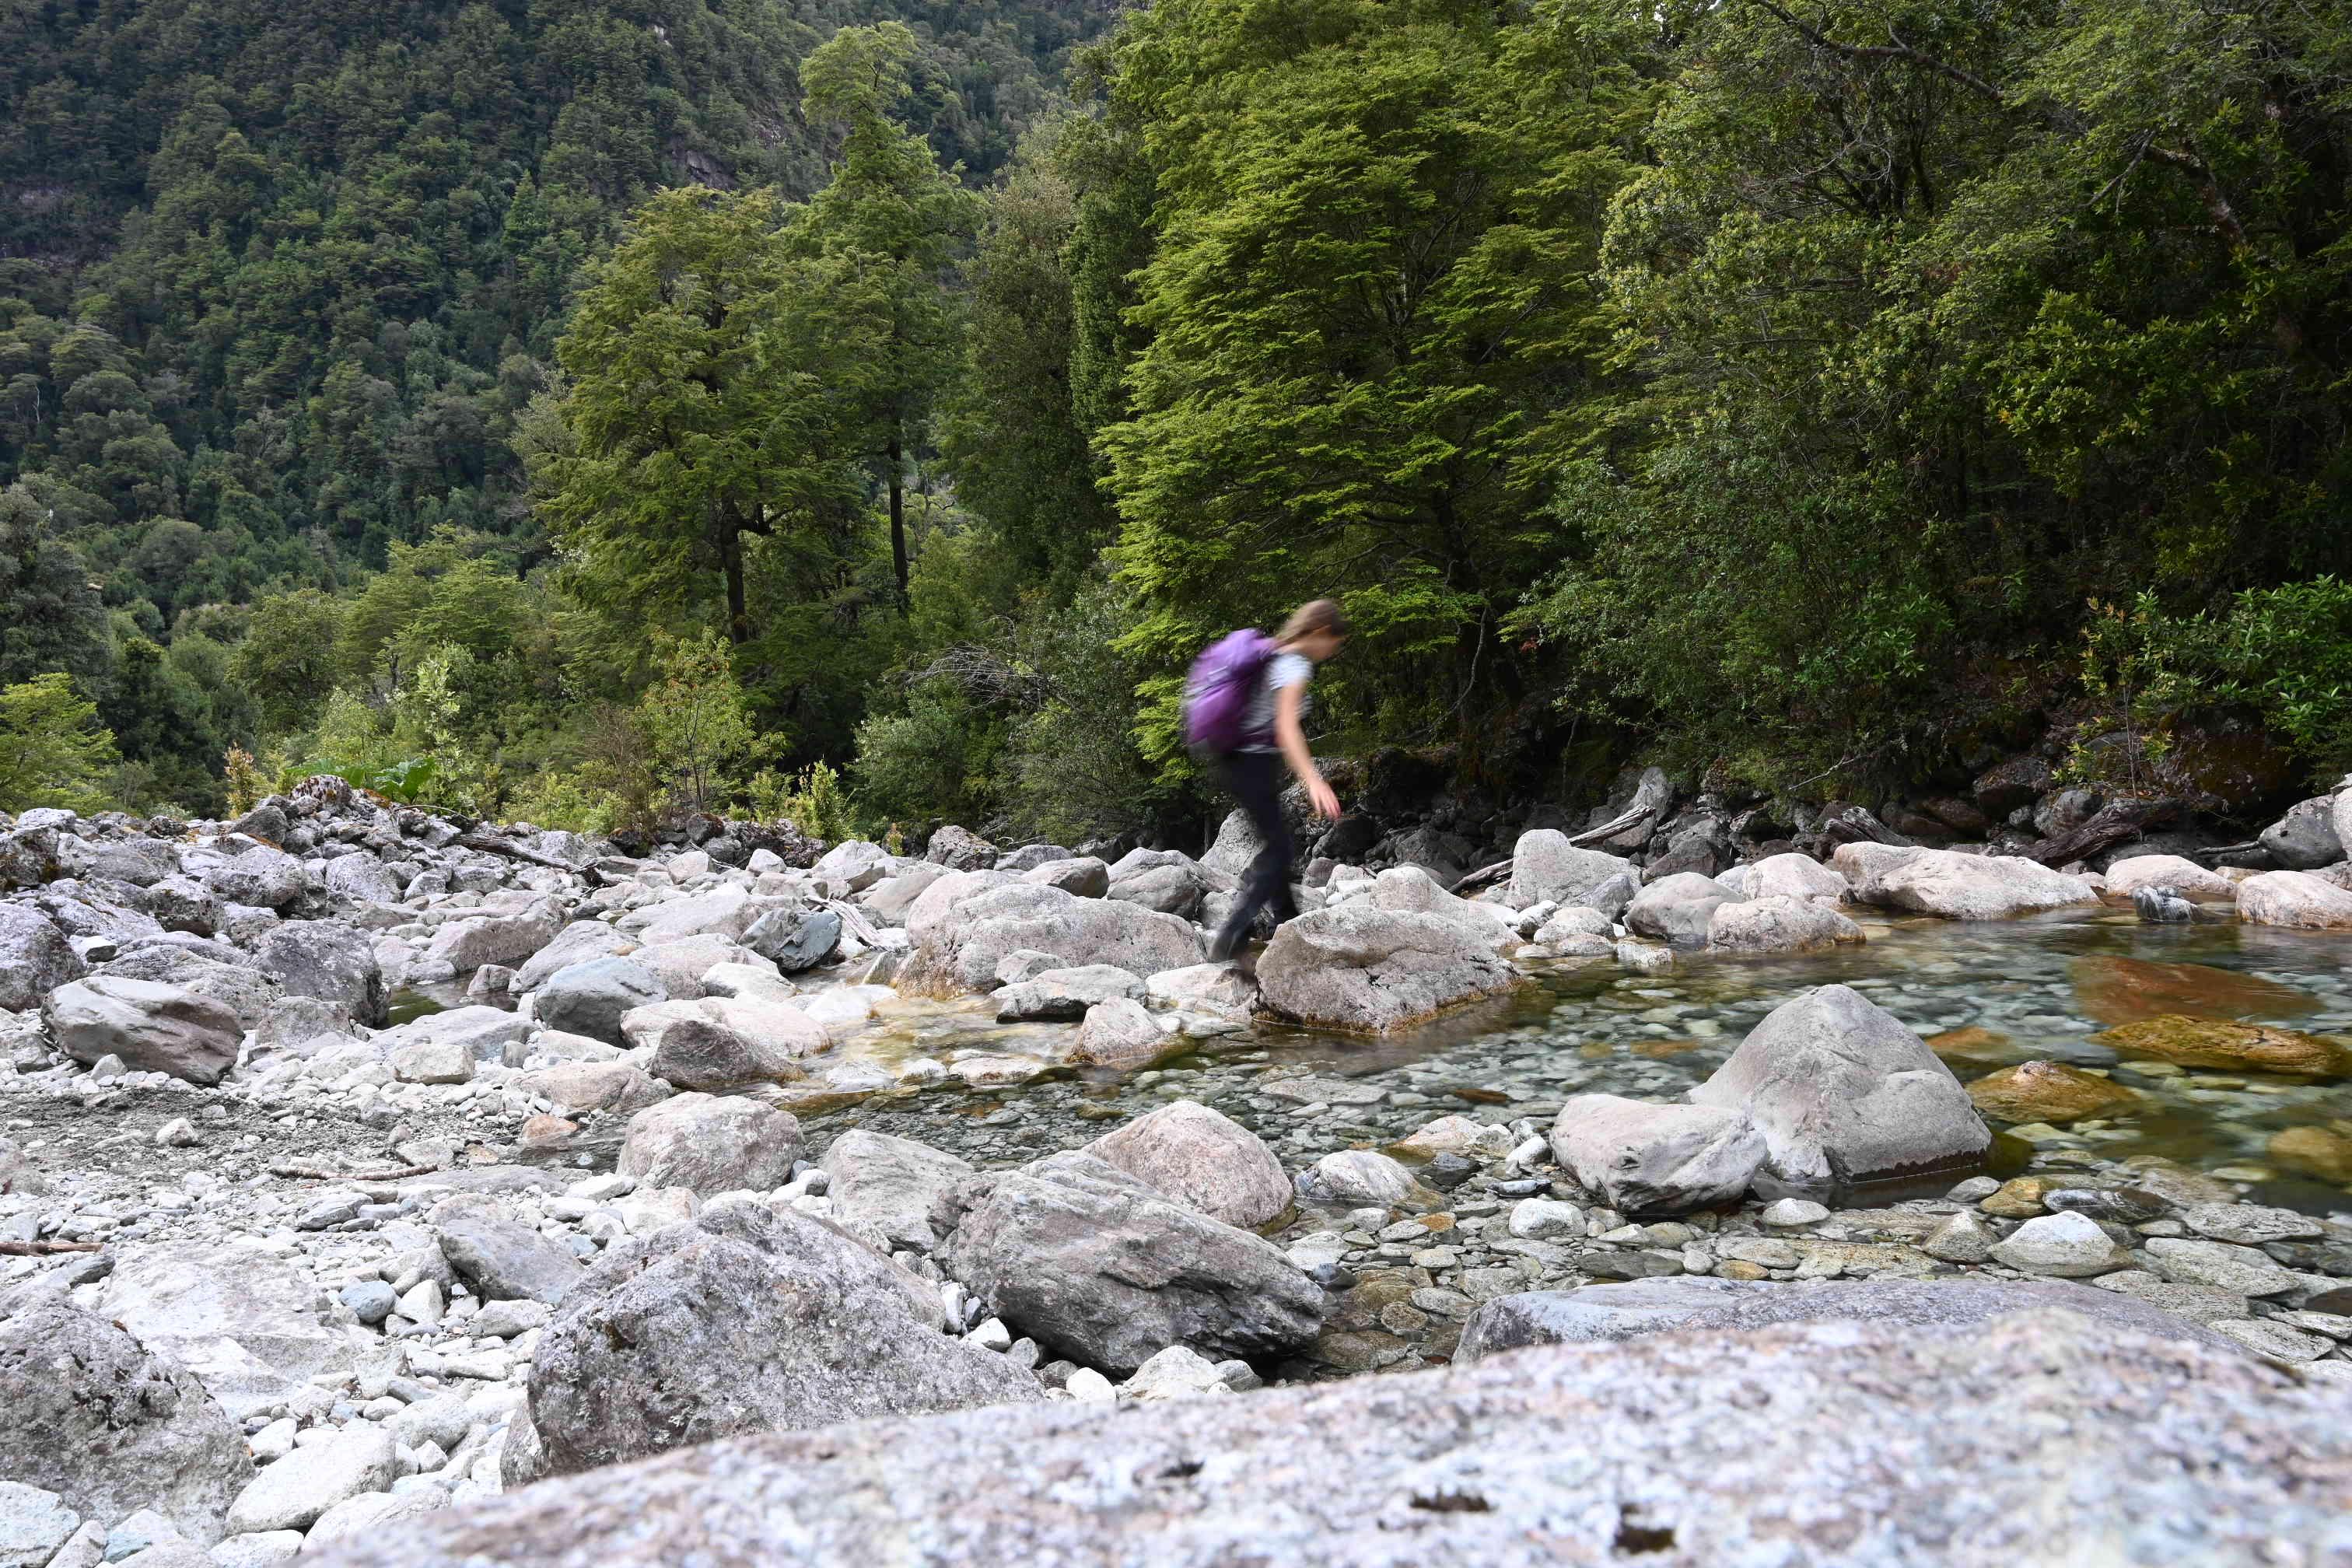 ženska pohodnica prečka reko